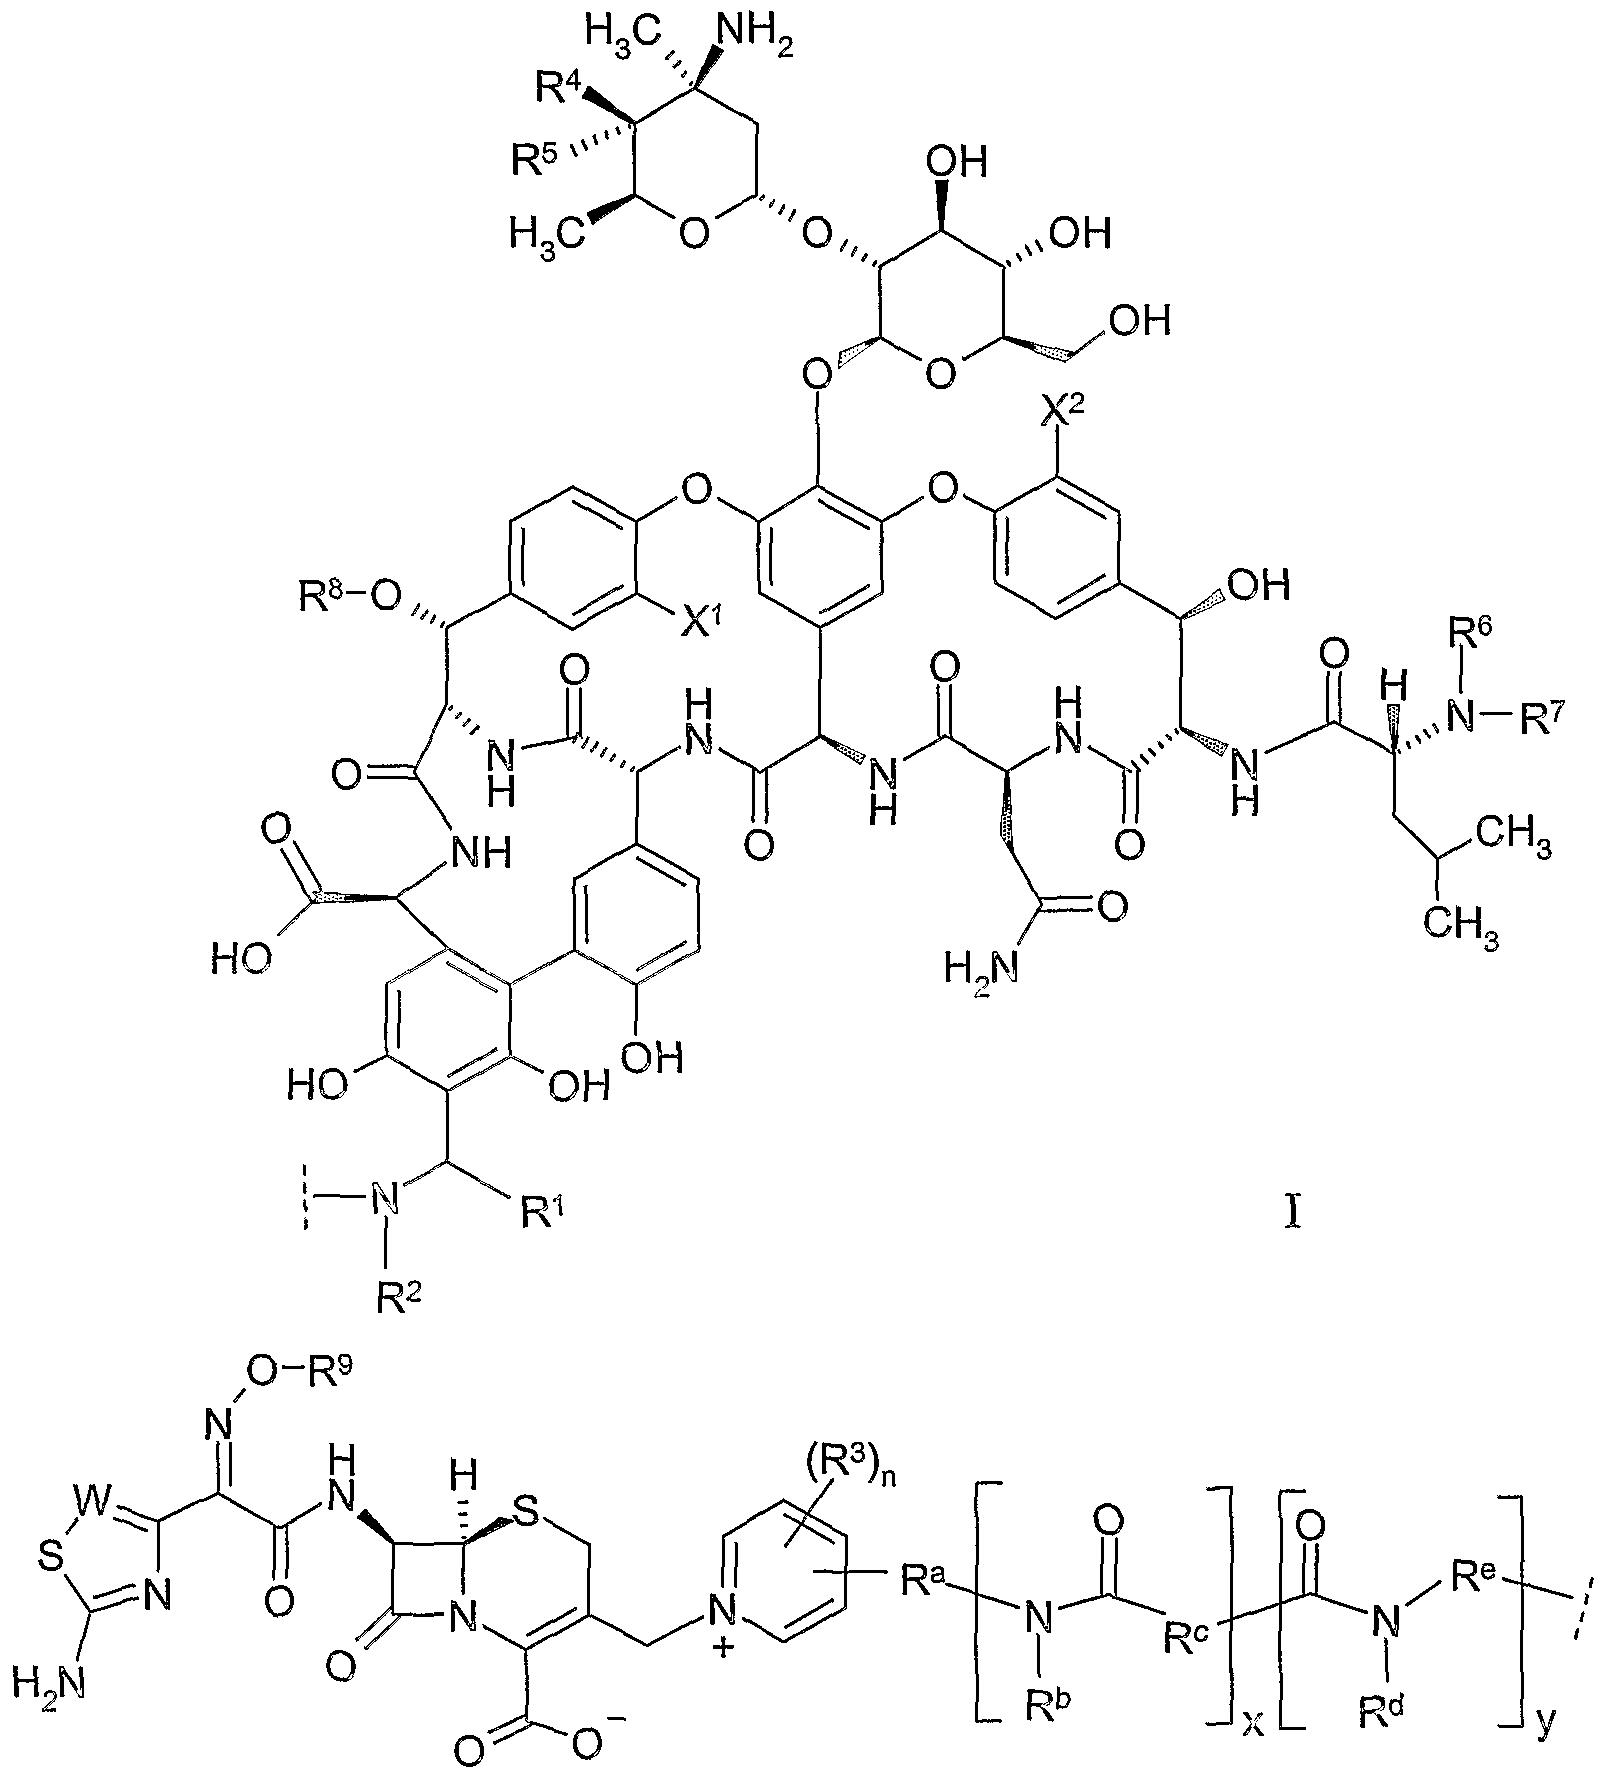 Glycopeptide Cephalosporin Heterodimer All About Drugs